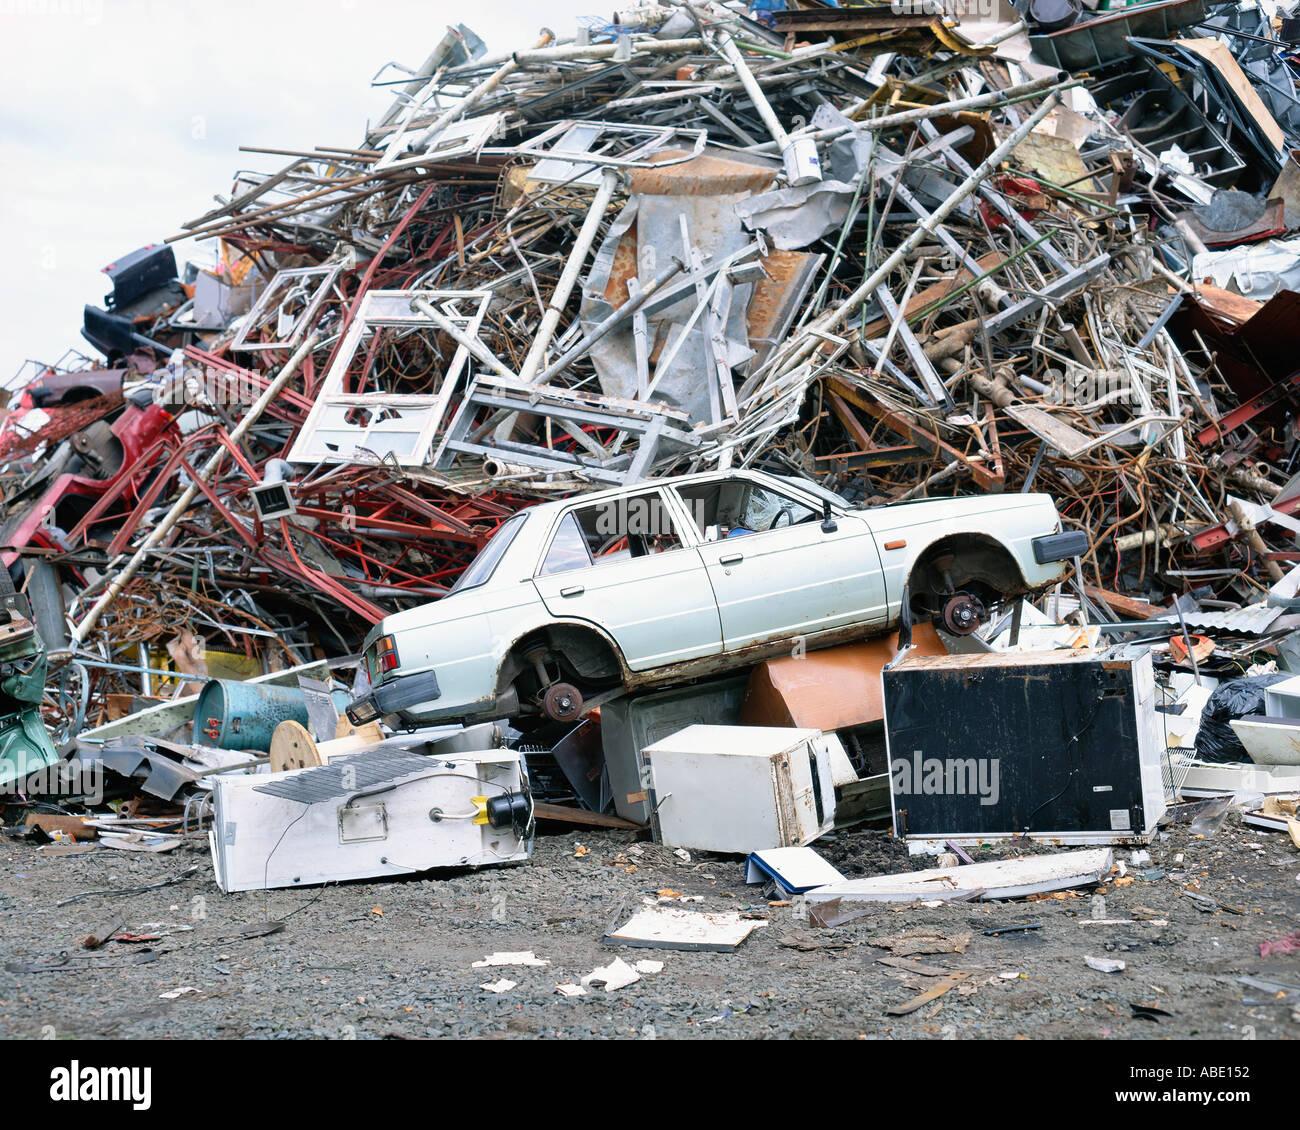 Rubbish dump - Stock Image